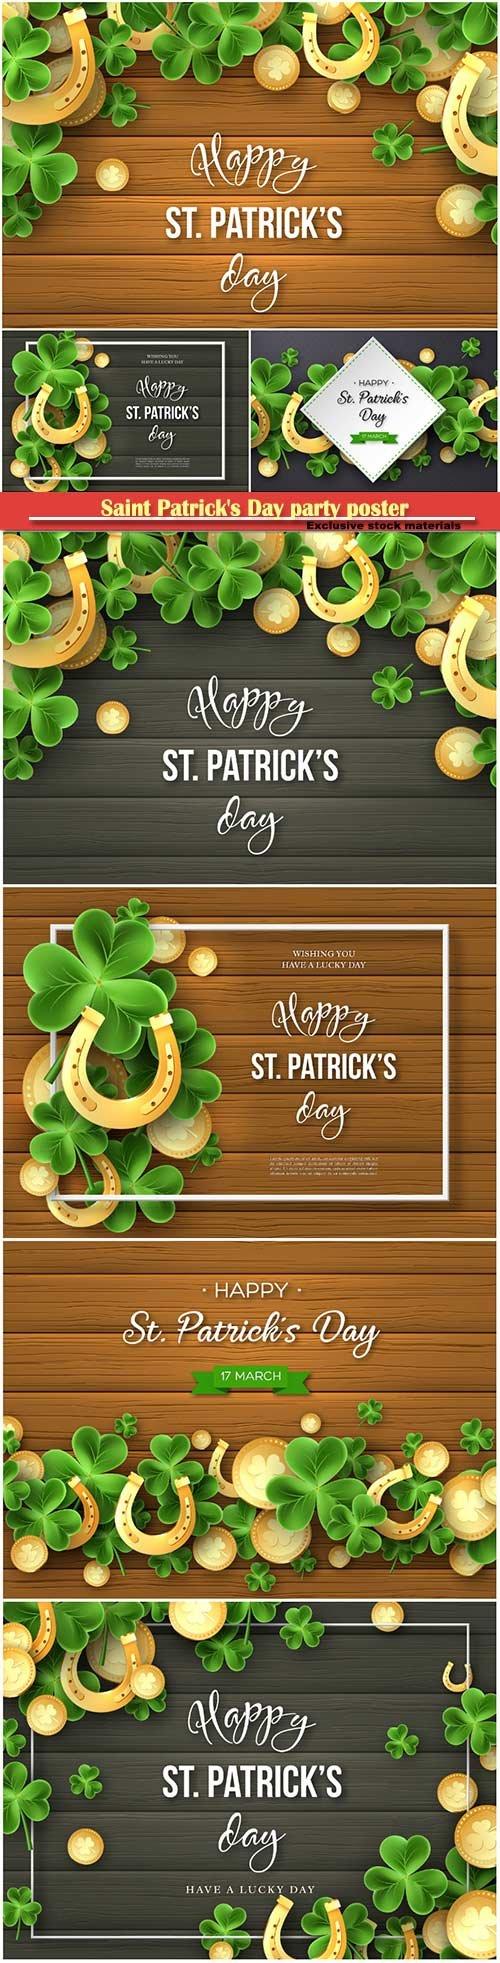 St.Patricks Day background greeting holiday design